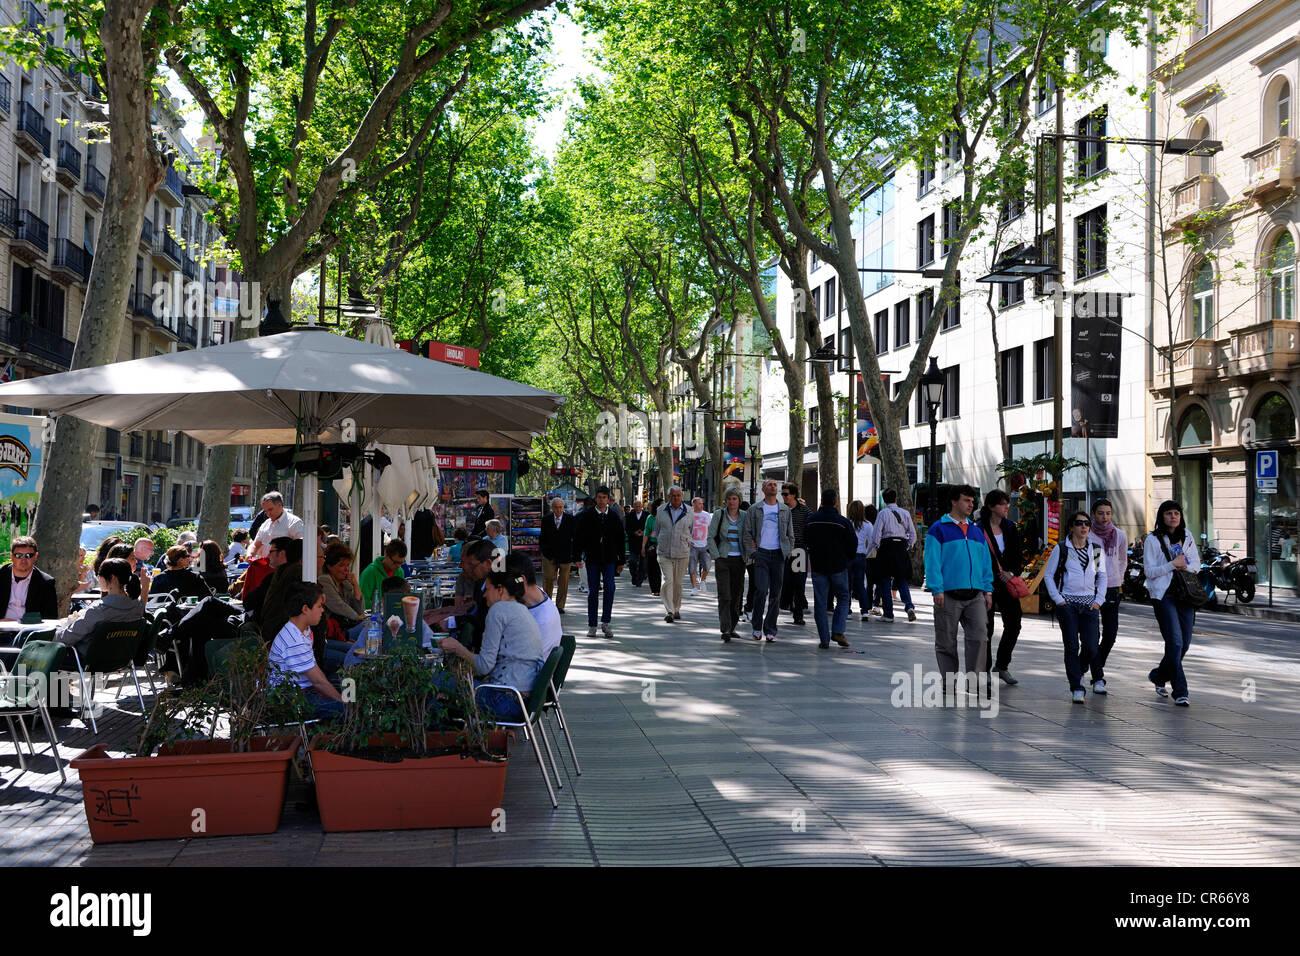 Spain, Catalonia, Barcelona, La Rambla - Stock Image